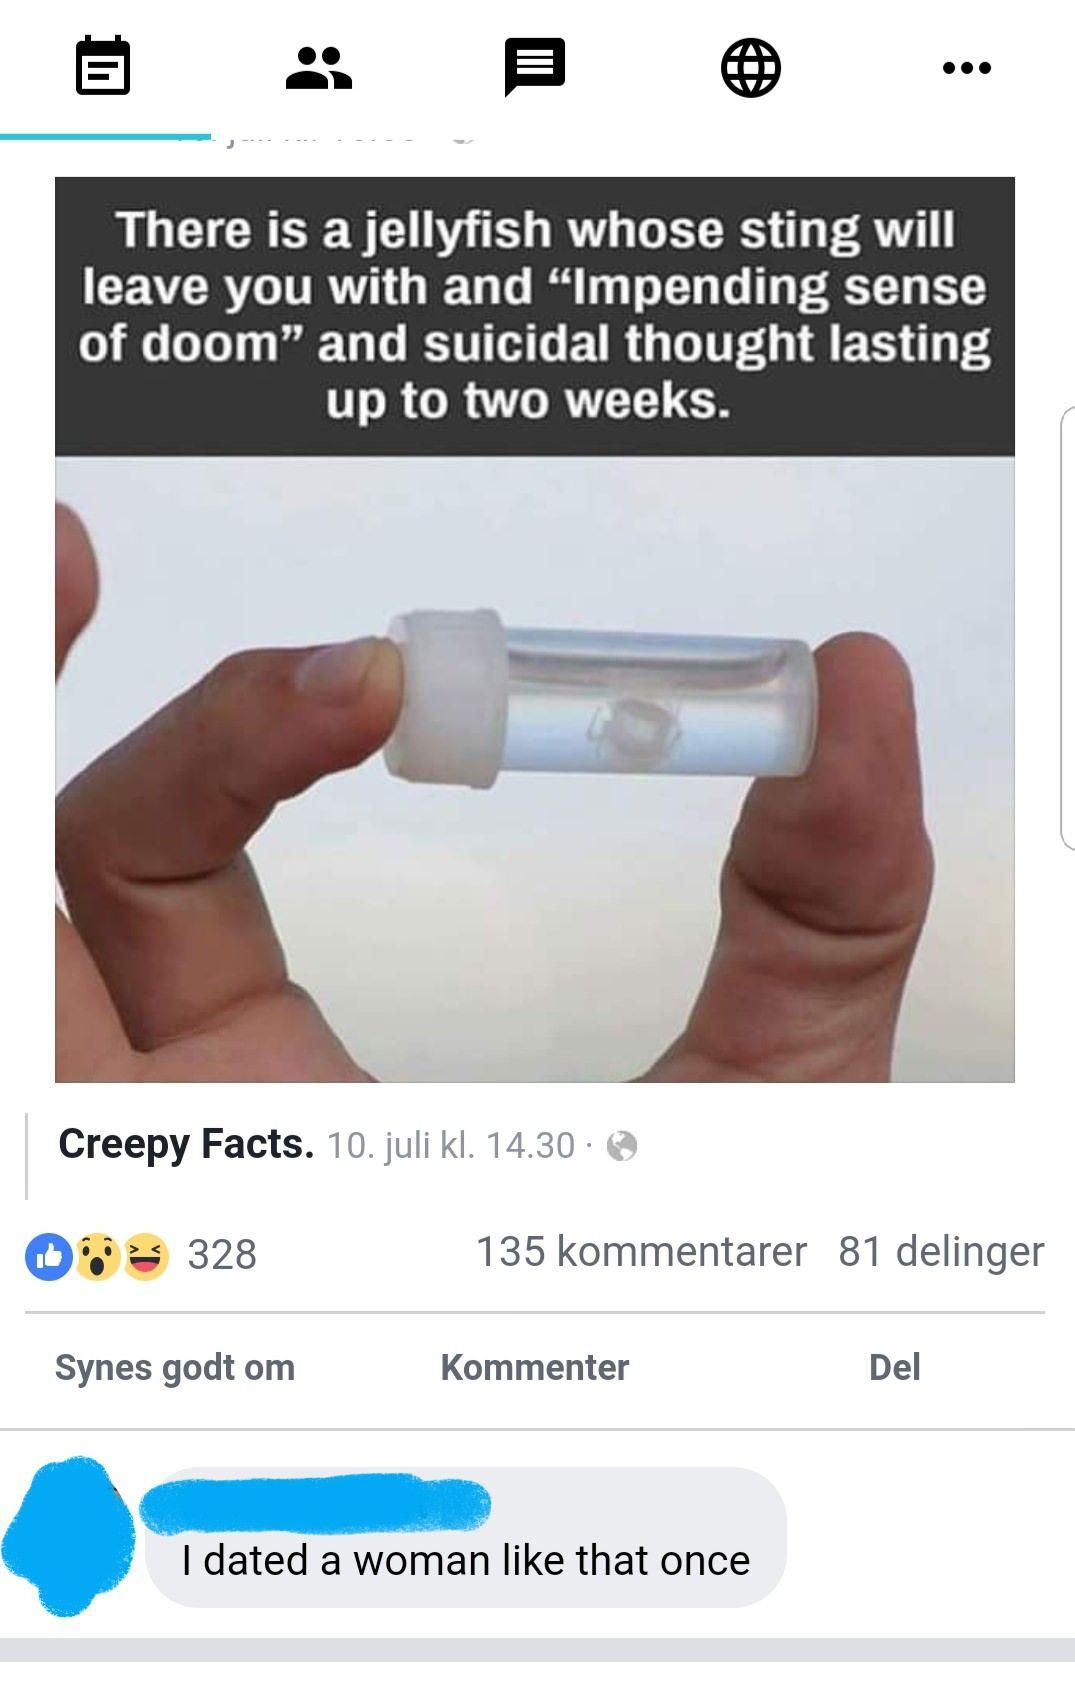 Facebook was quite savage today